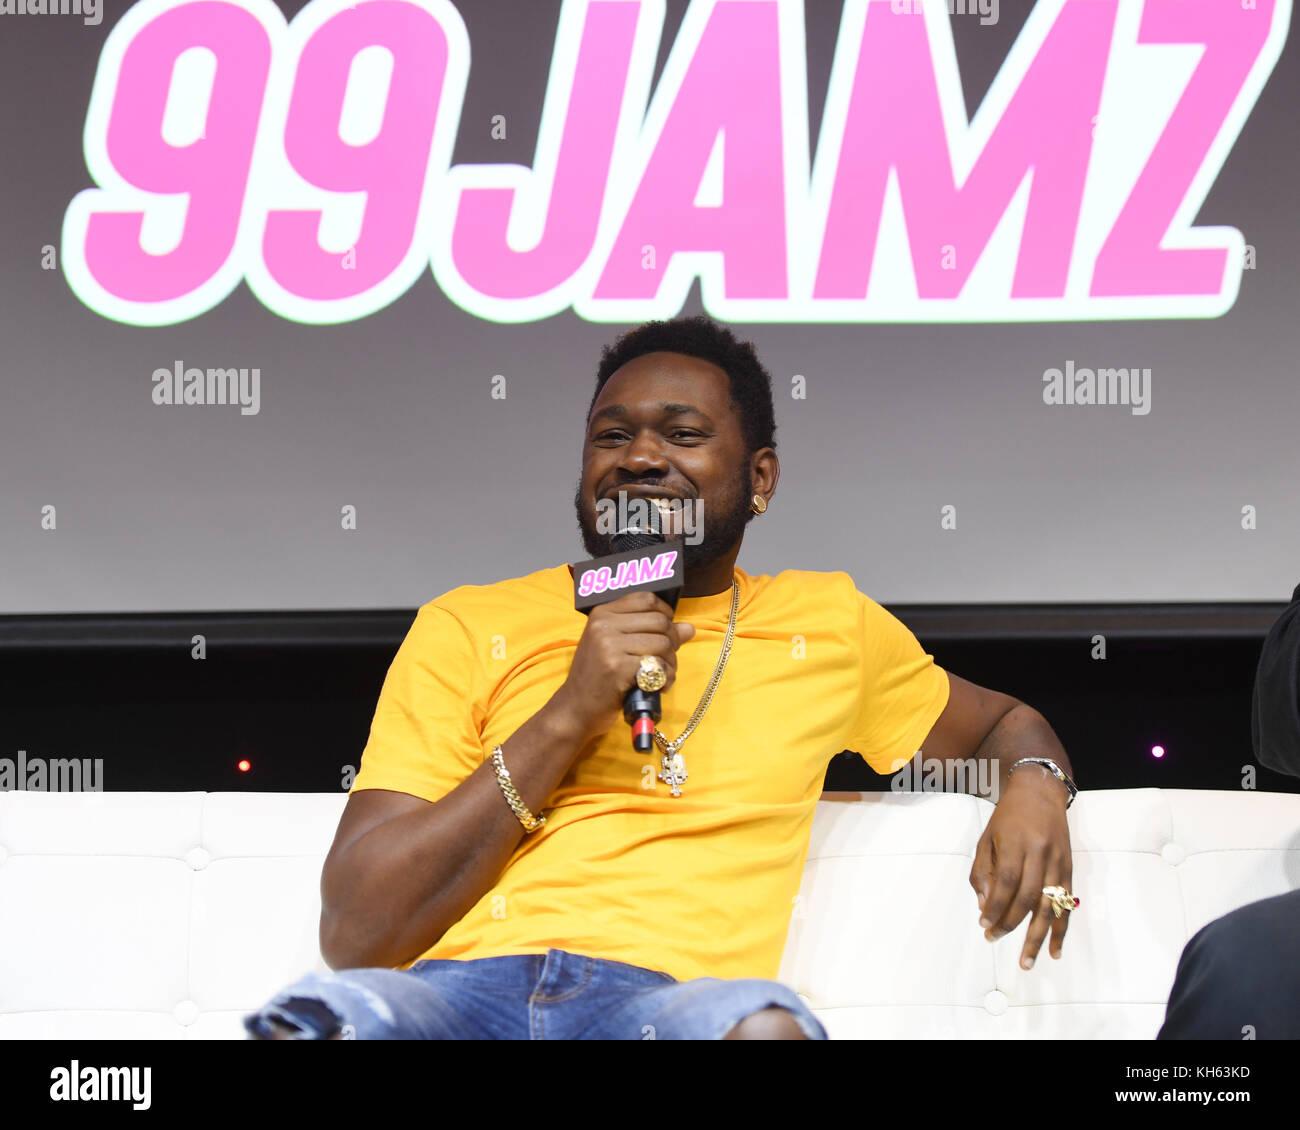 Kranium At Jamz Live Radio Station 99 On November 13 2017 In Hollywood Florida Credit Mpi04 Media Punch Alamy News